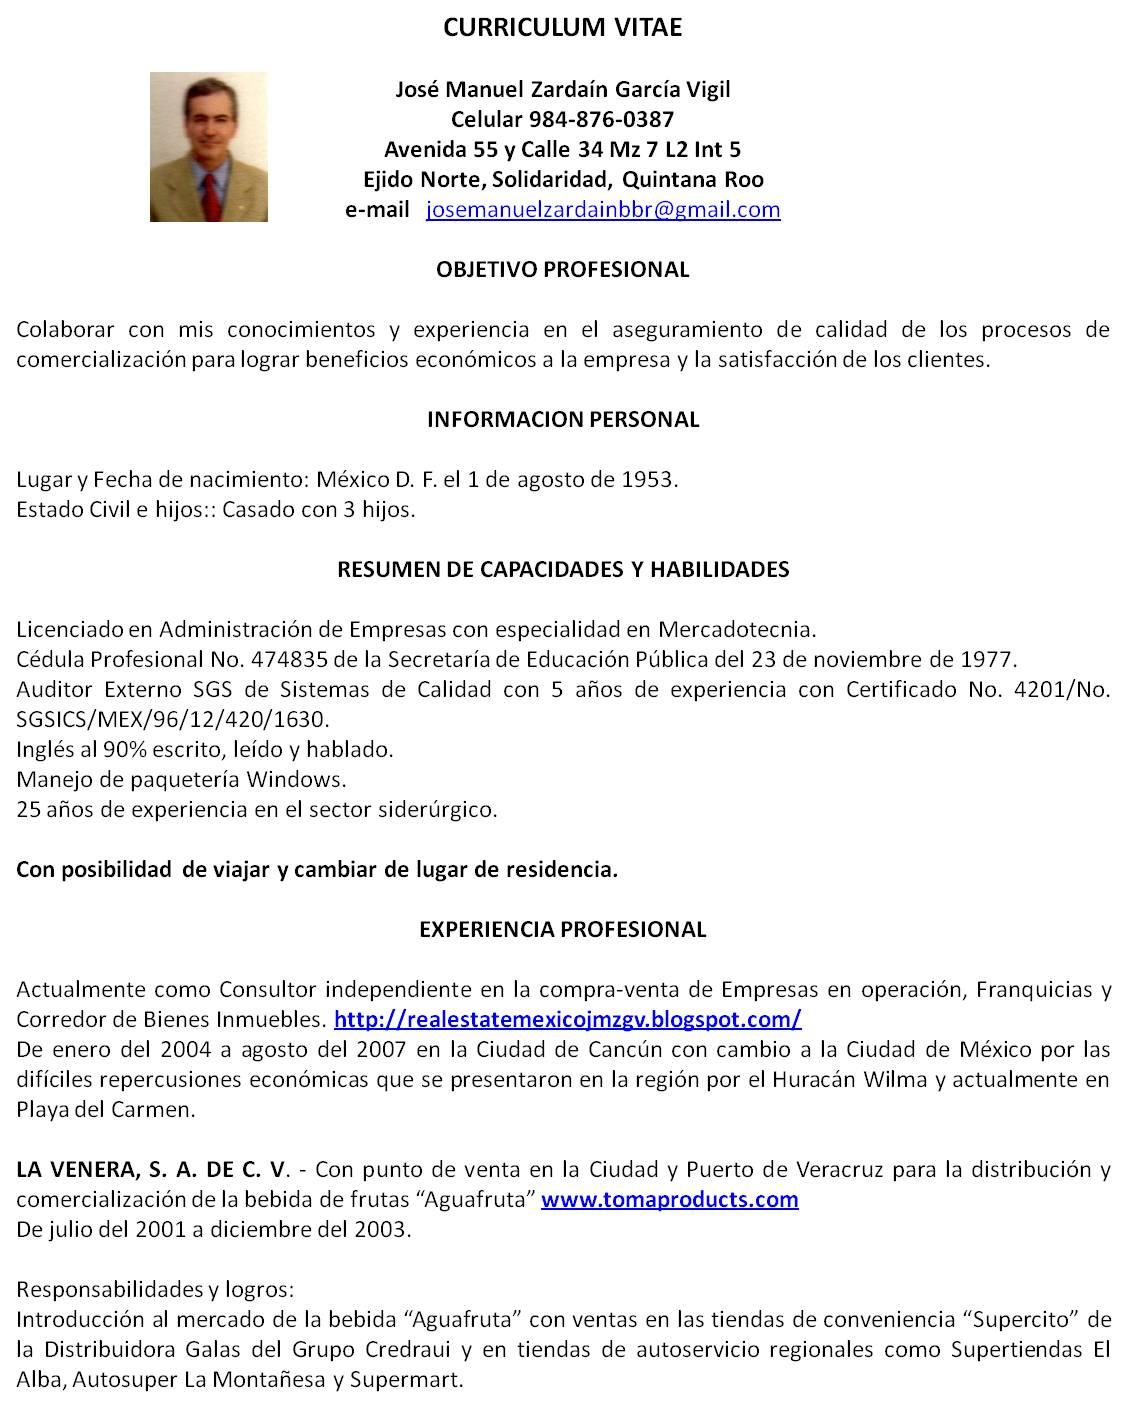 Curriculum Vitae Jose Manuel Zardain G. V. | Curriculum Vitae JMZGV